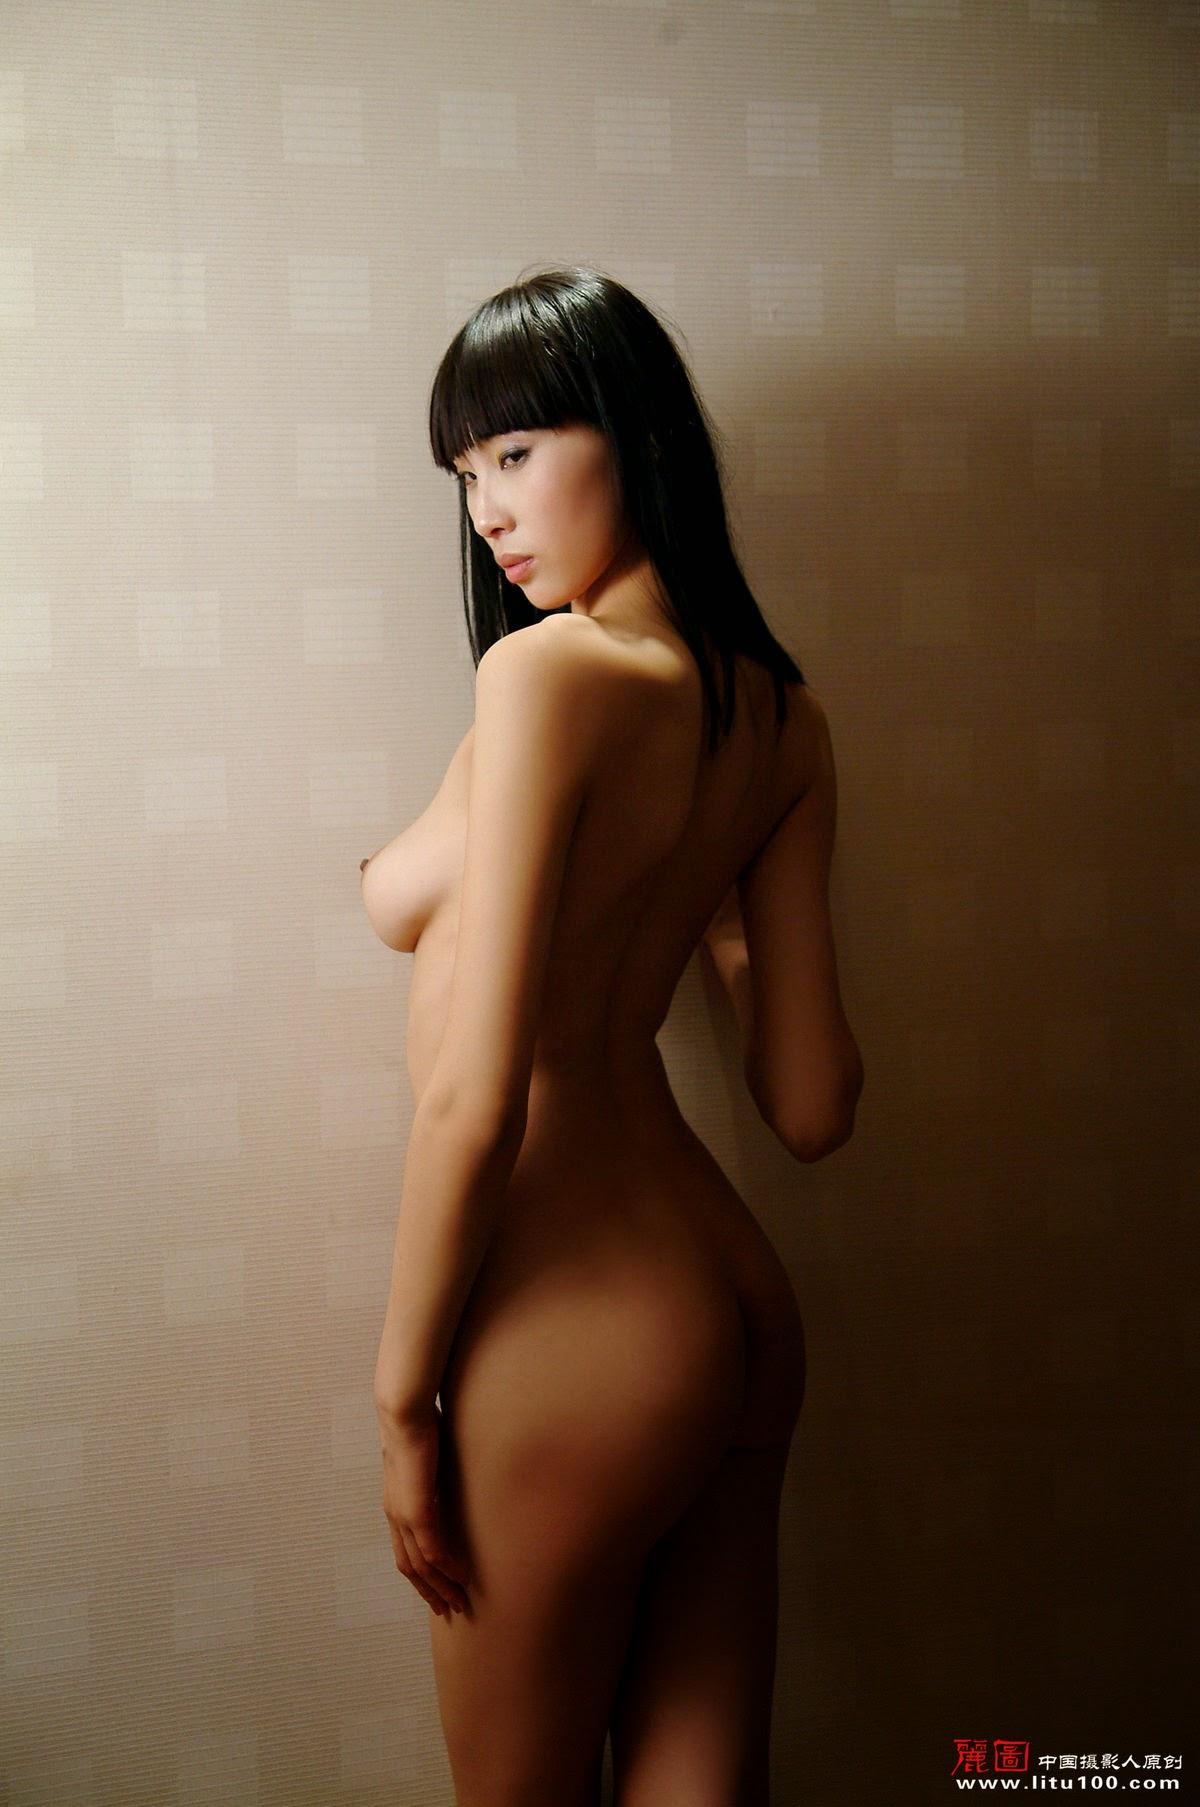 litu 100 archives: Chinese Nude Model Wei Wei 03 [Litu100] | 18+ gallery photos